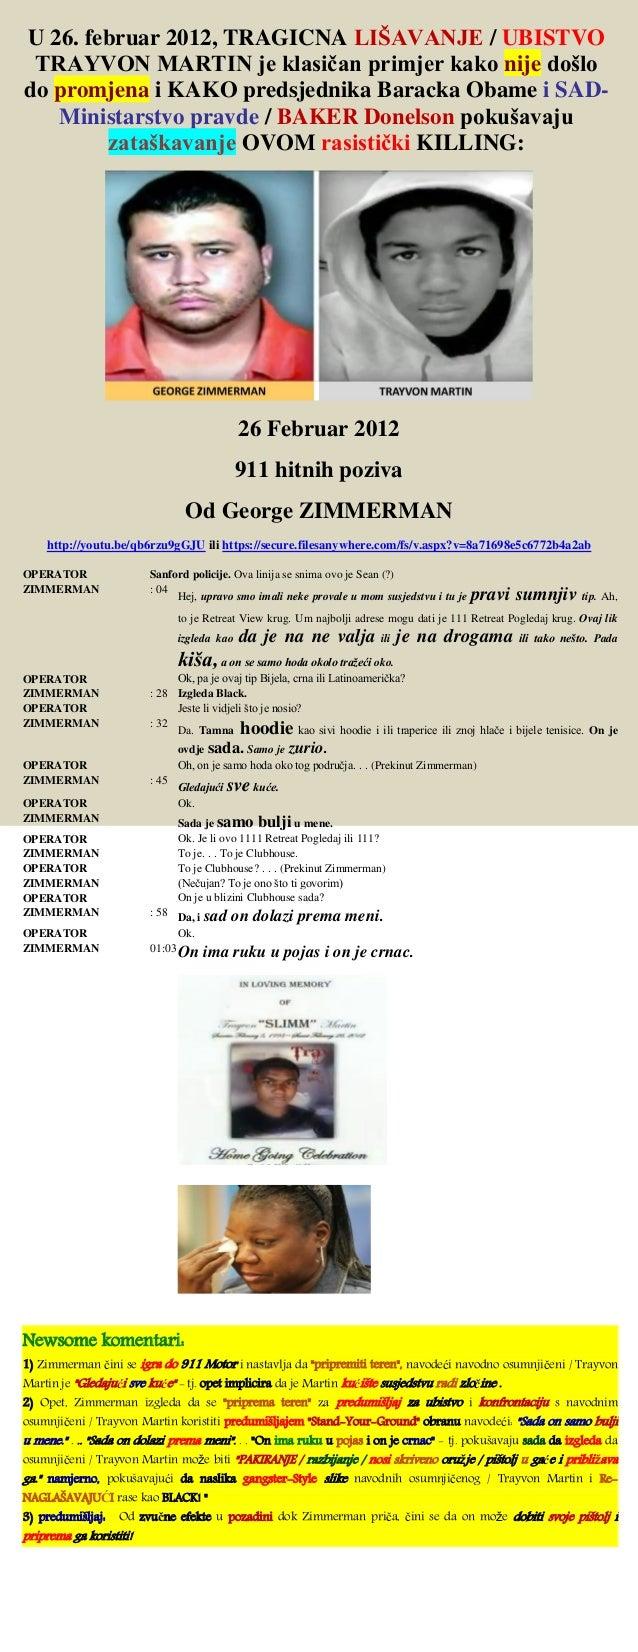 02-26-2012 GEORGE ZIMMERMAN'S EMERGENCY 911 CALL (bosnian)